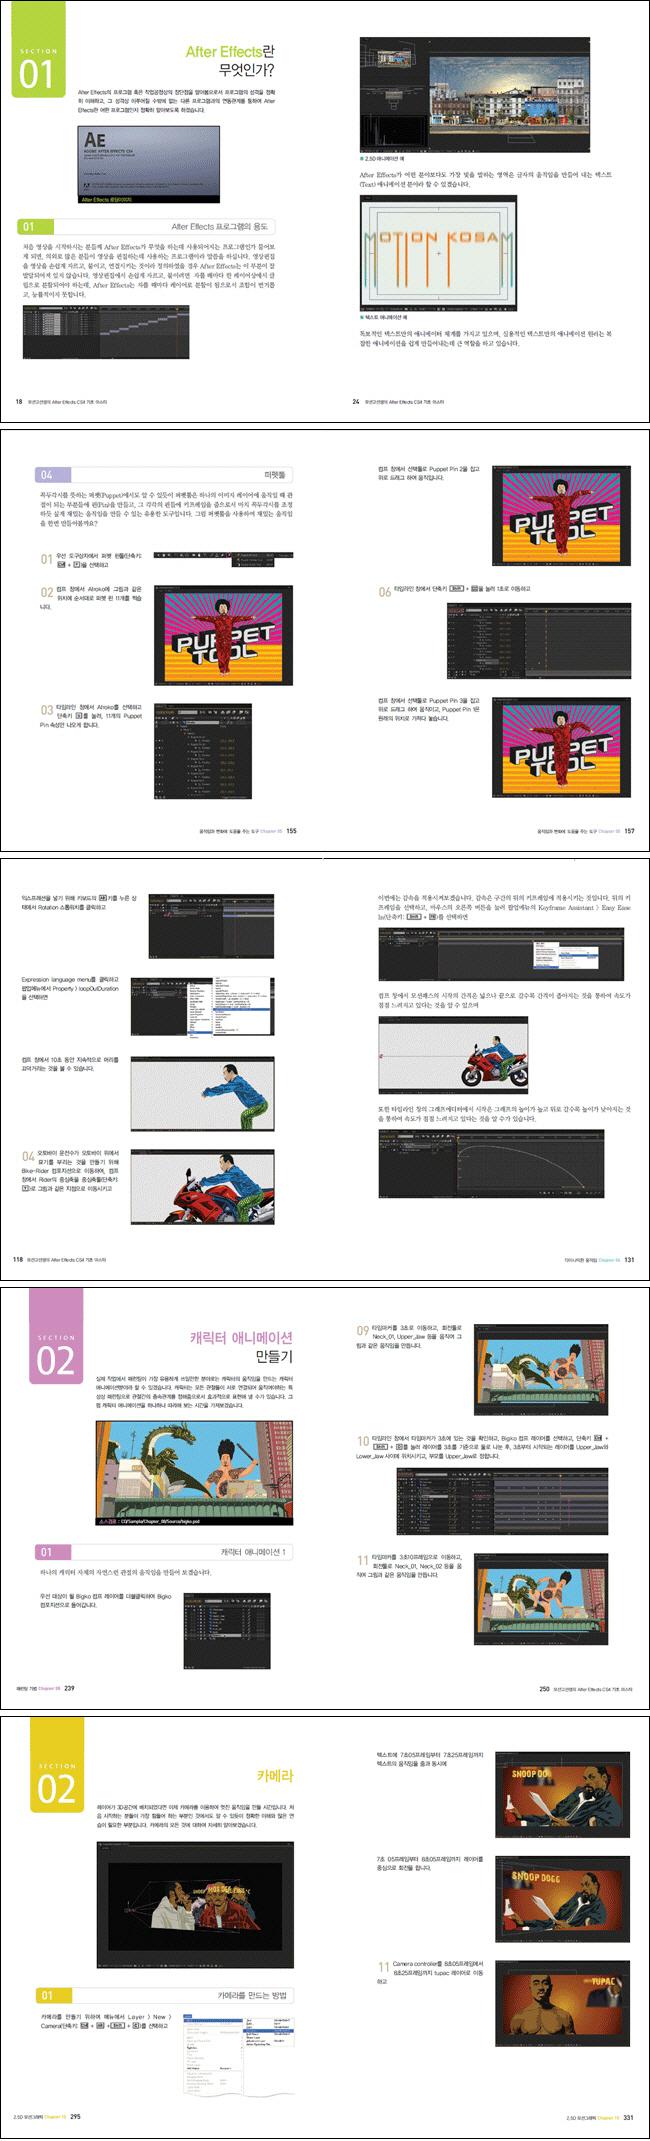 AFTER EFFECTS CS4 기초 마스터(모션고선생의)(CD1장포함) 도서 상세이미지